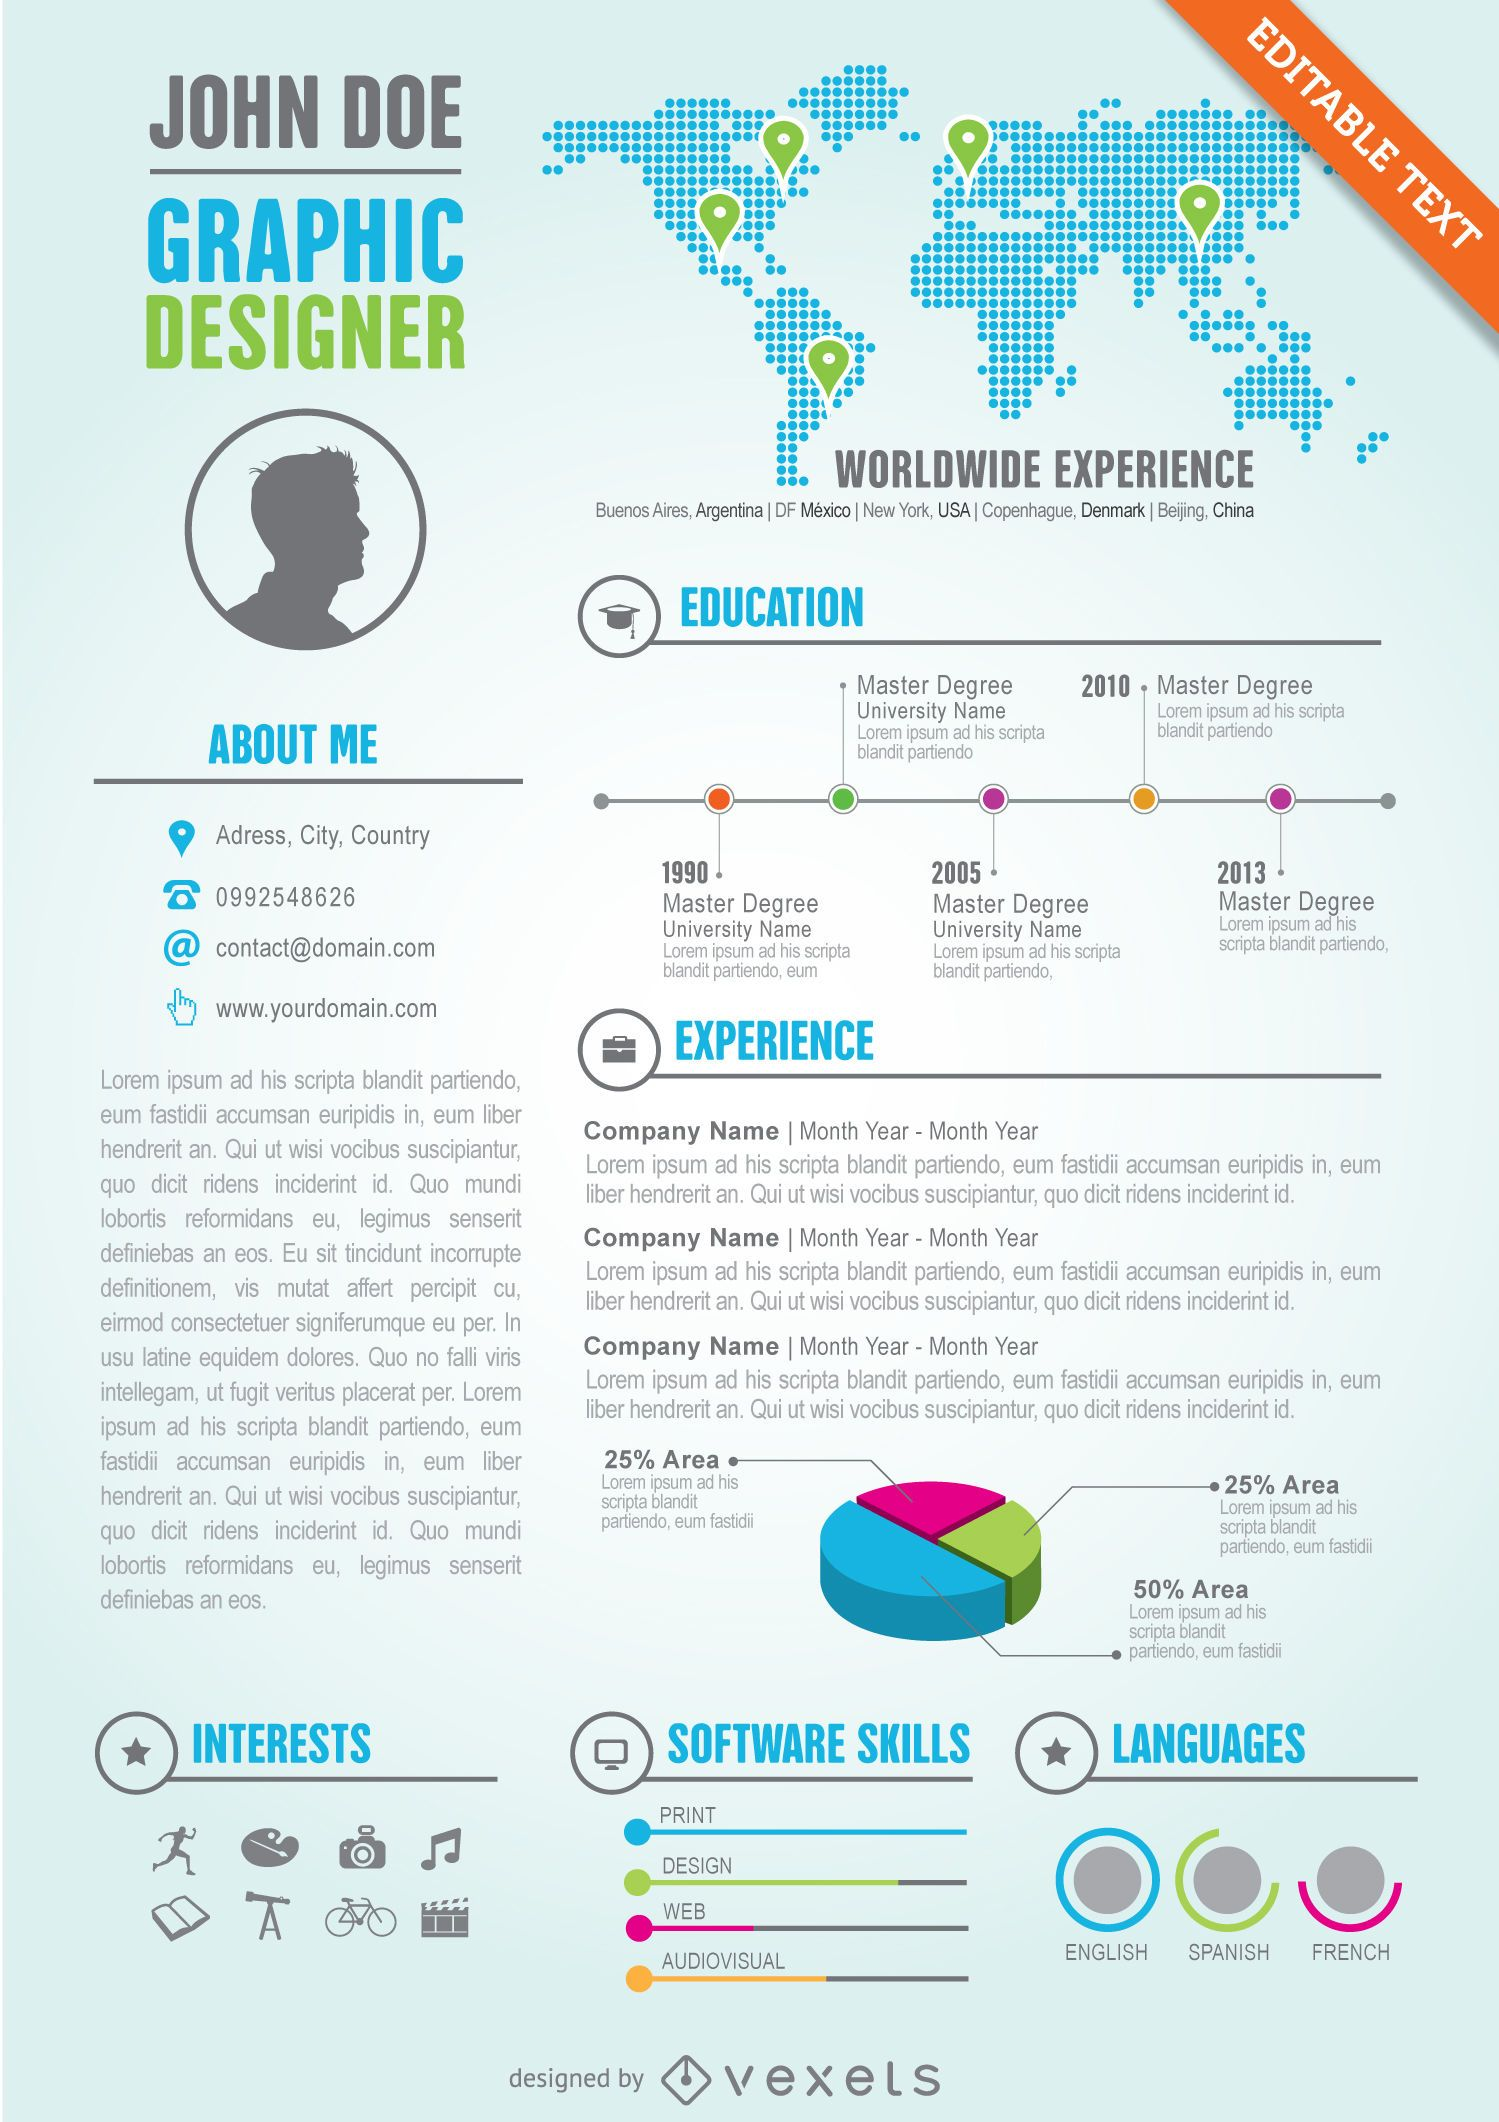 Plantilla de curriculum vitae editable de diseñador gráfico